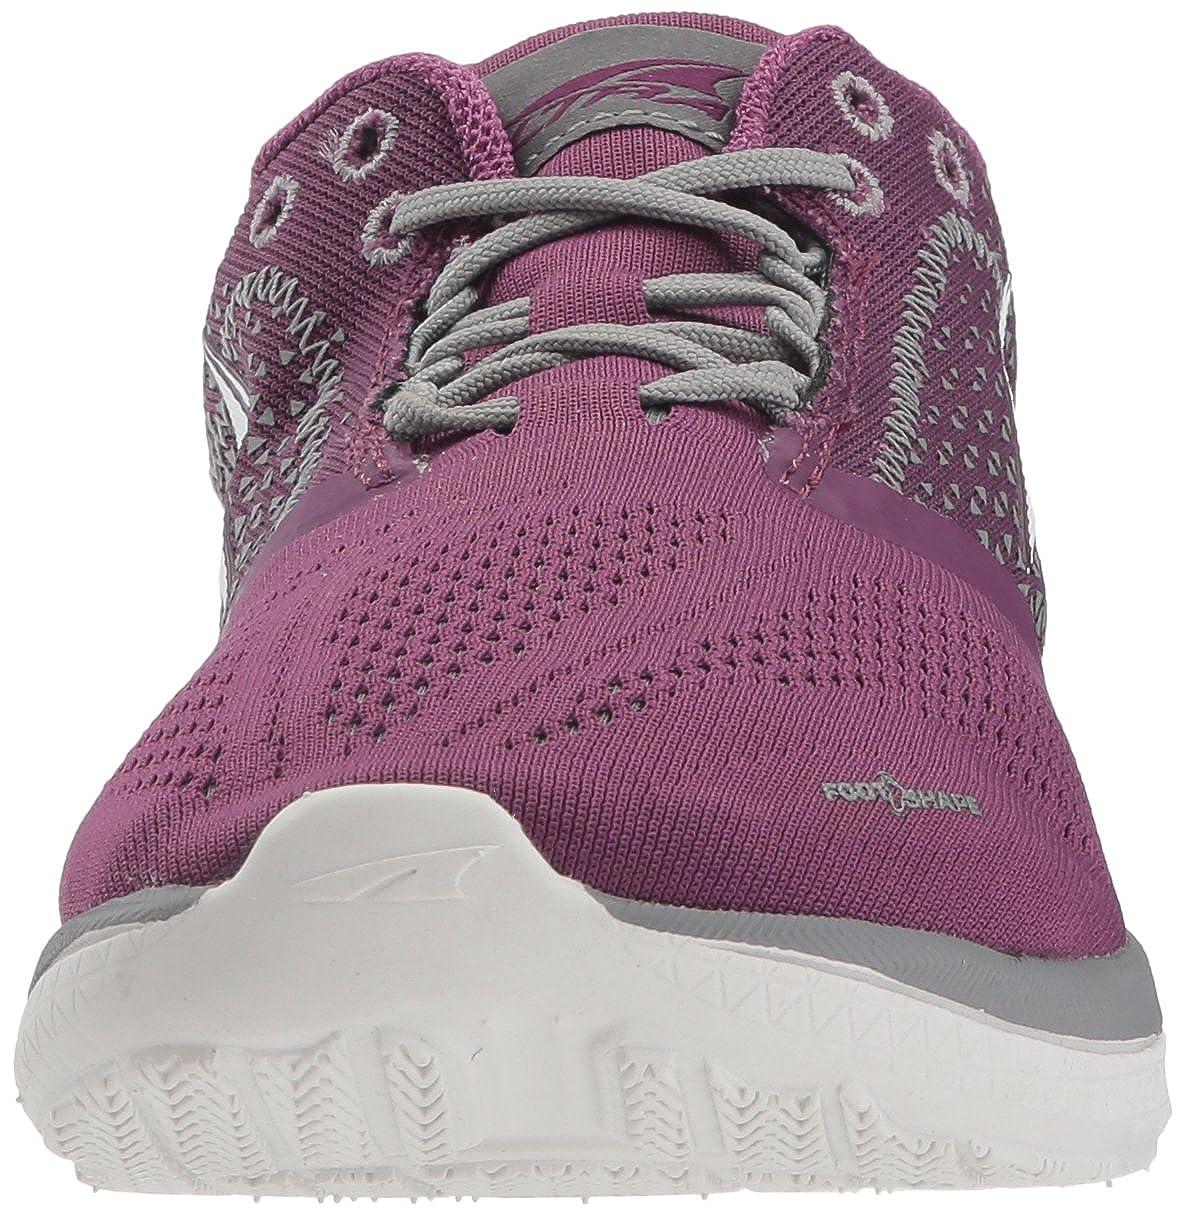 Altra AFW1836P Womens Solstice Road Running Shoe